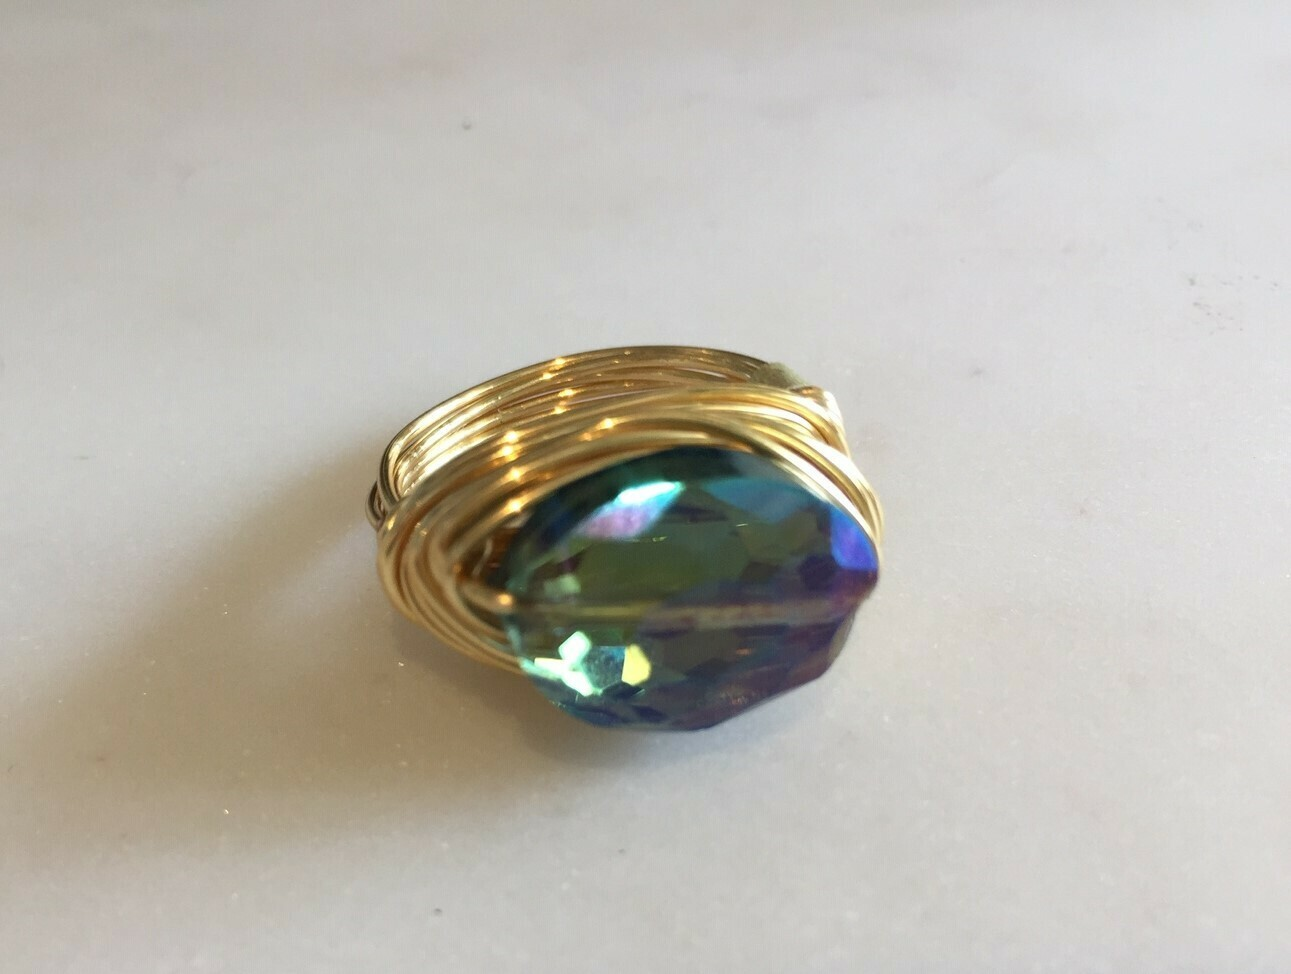 GR773 Enrite Iridescent Swarovski Ring GF